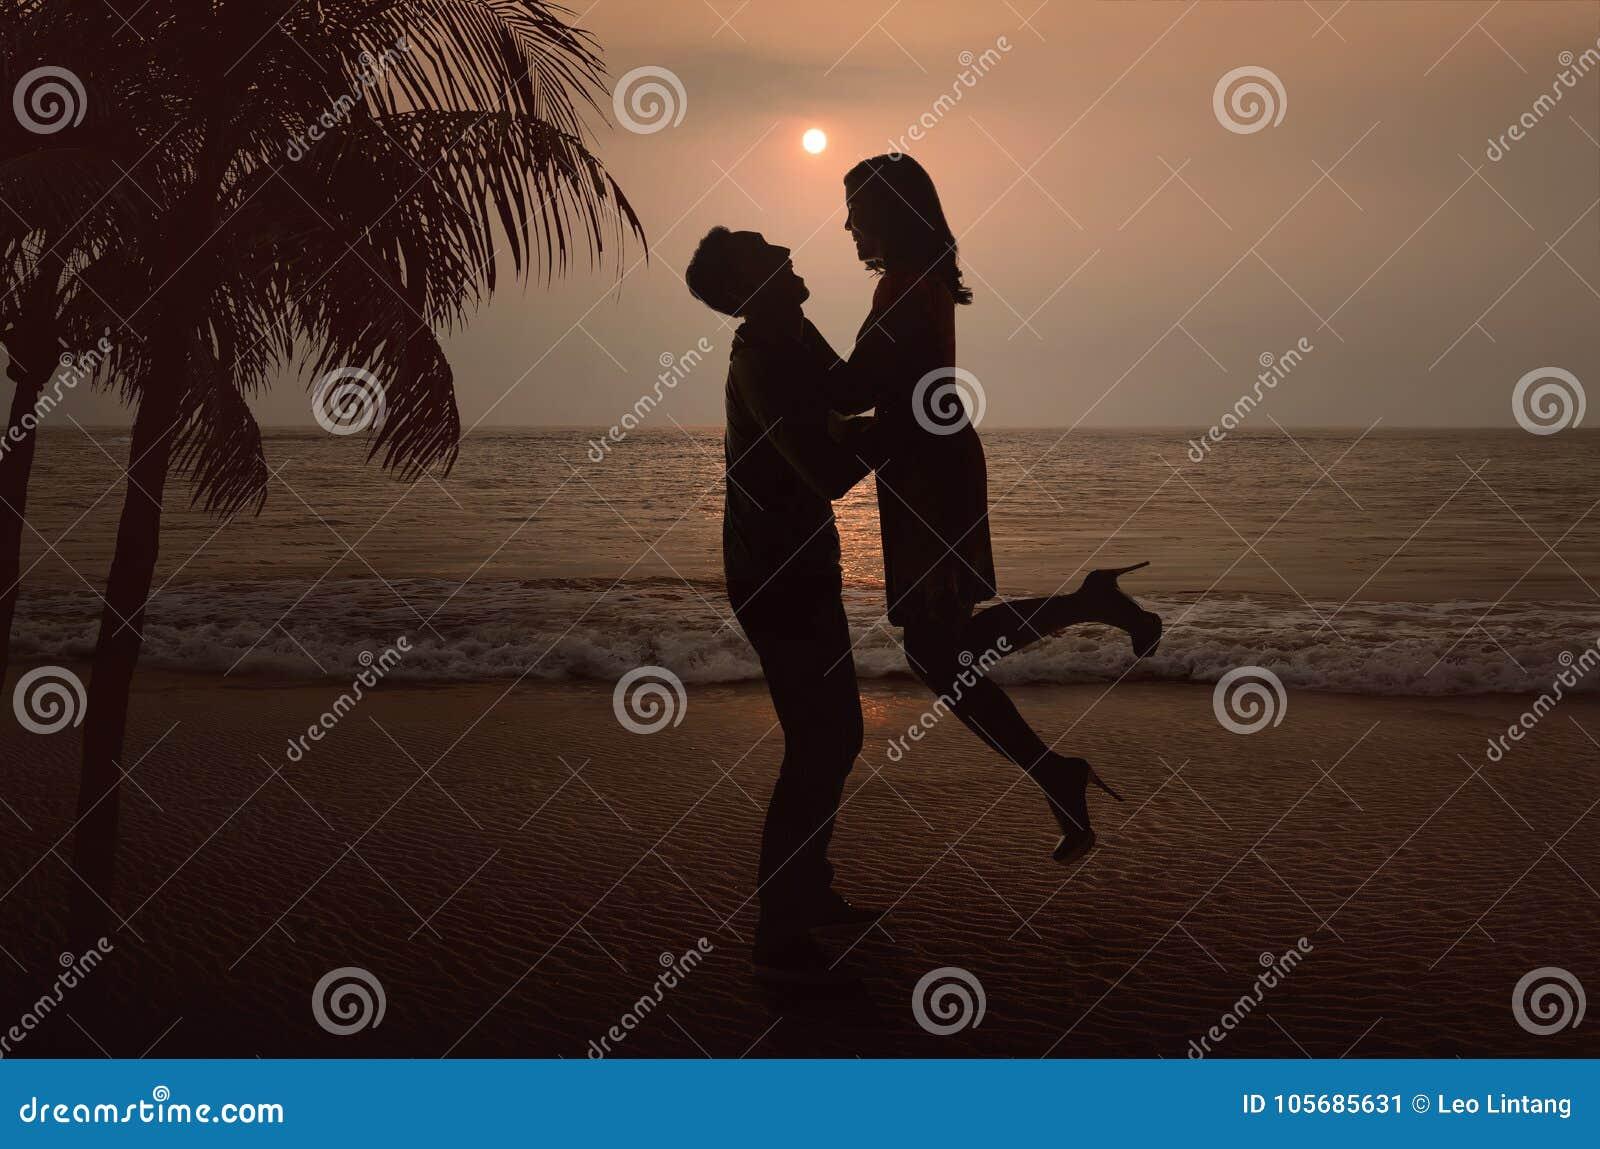 https://thumbs.dreamstime.com/z/silhouette-asian-couple-love-beach-sunset-105685631.jpg